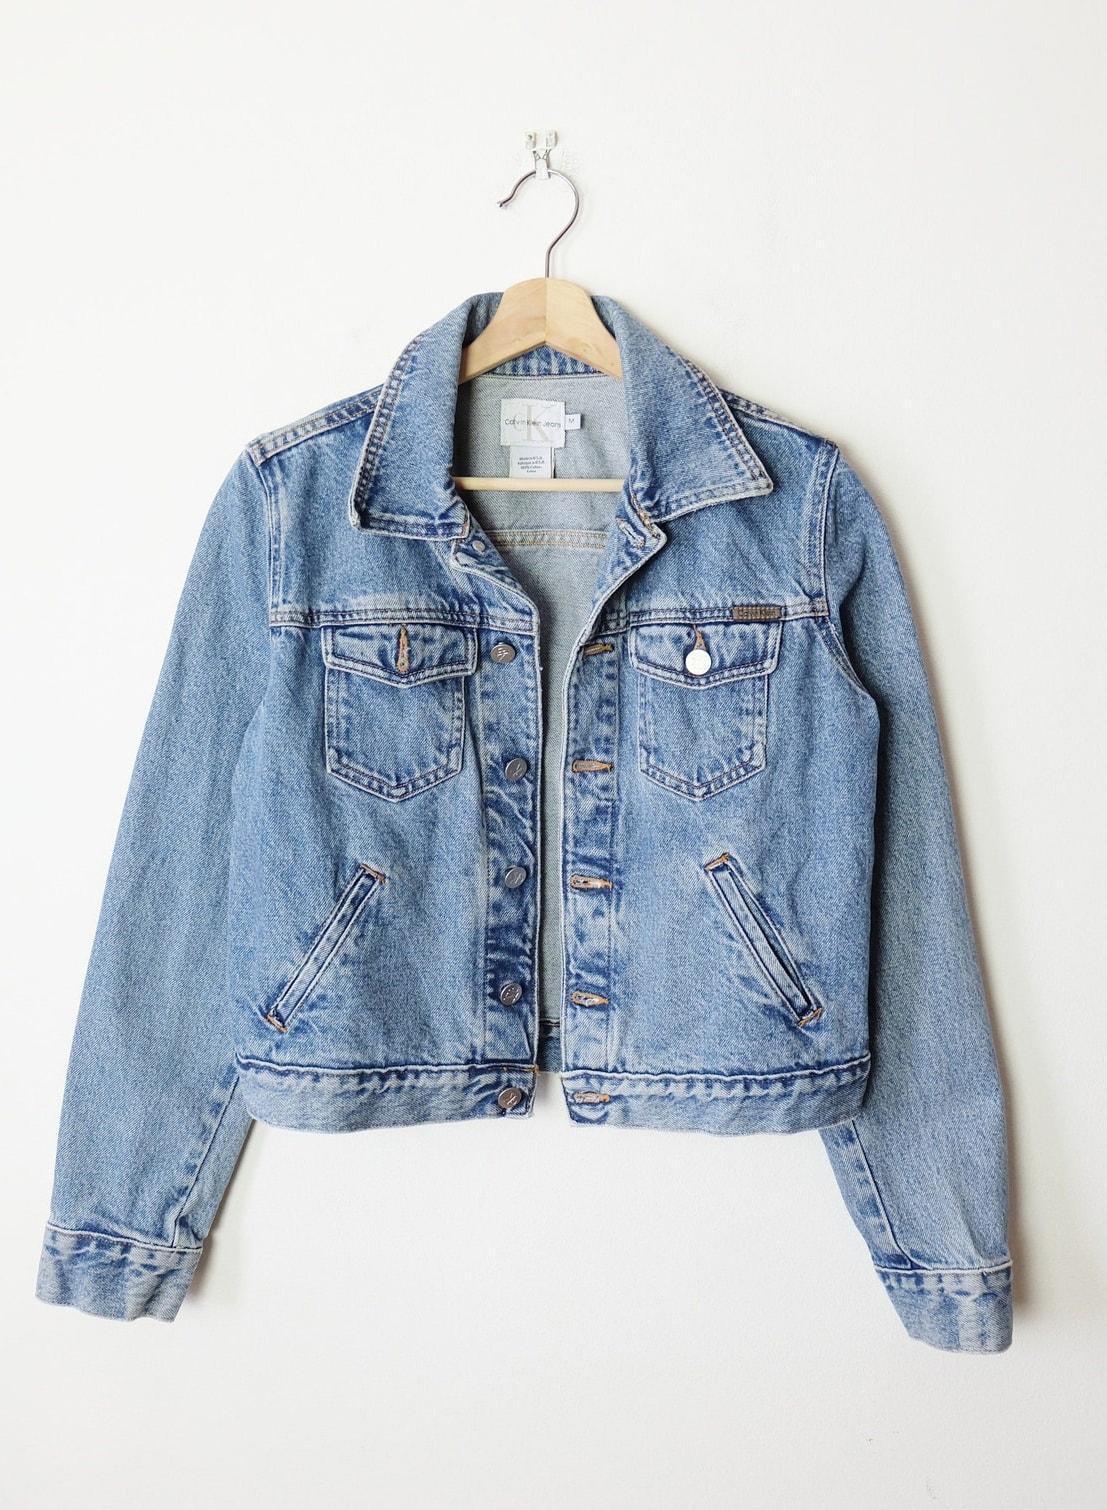 Women's Calvin Klein:CK Jean Jacket:Denim Jacket:Women's M